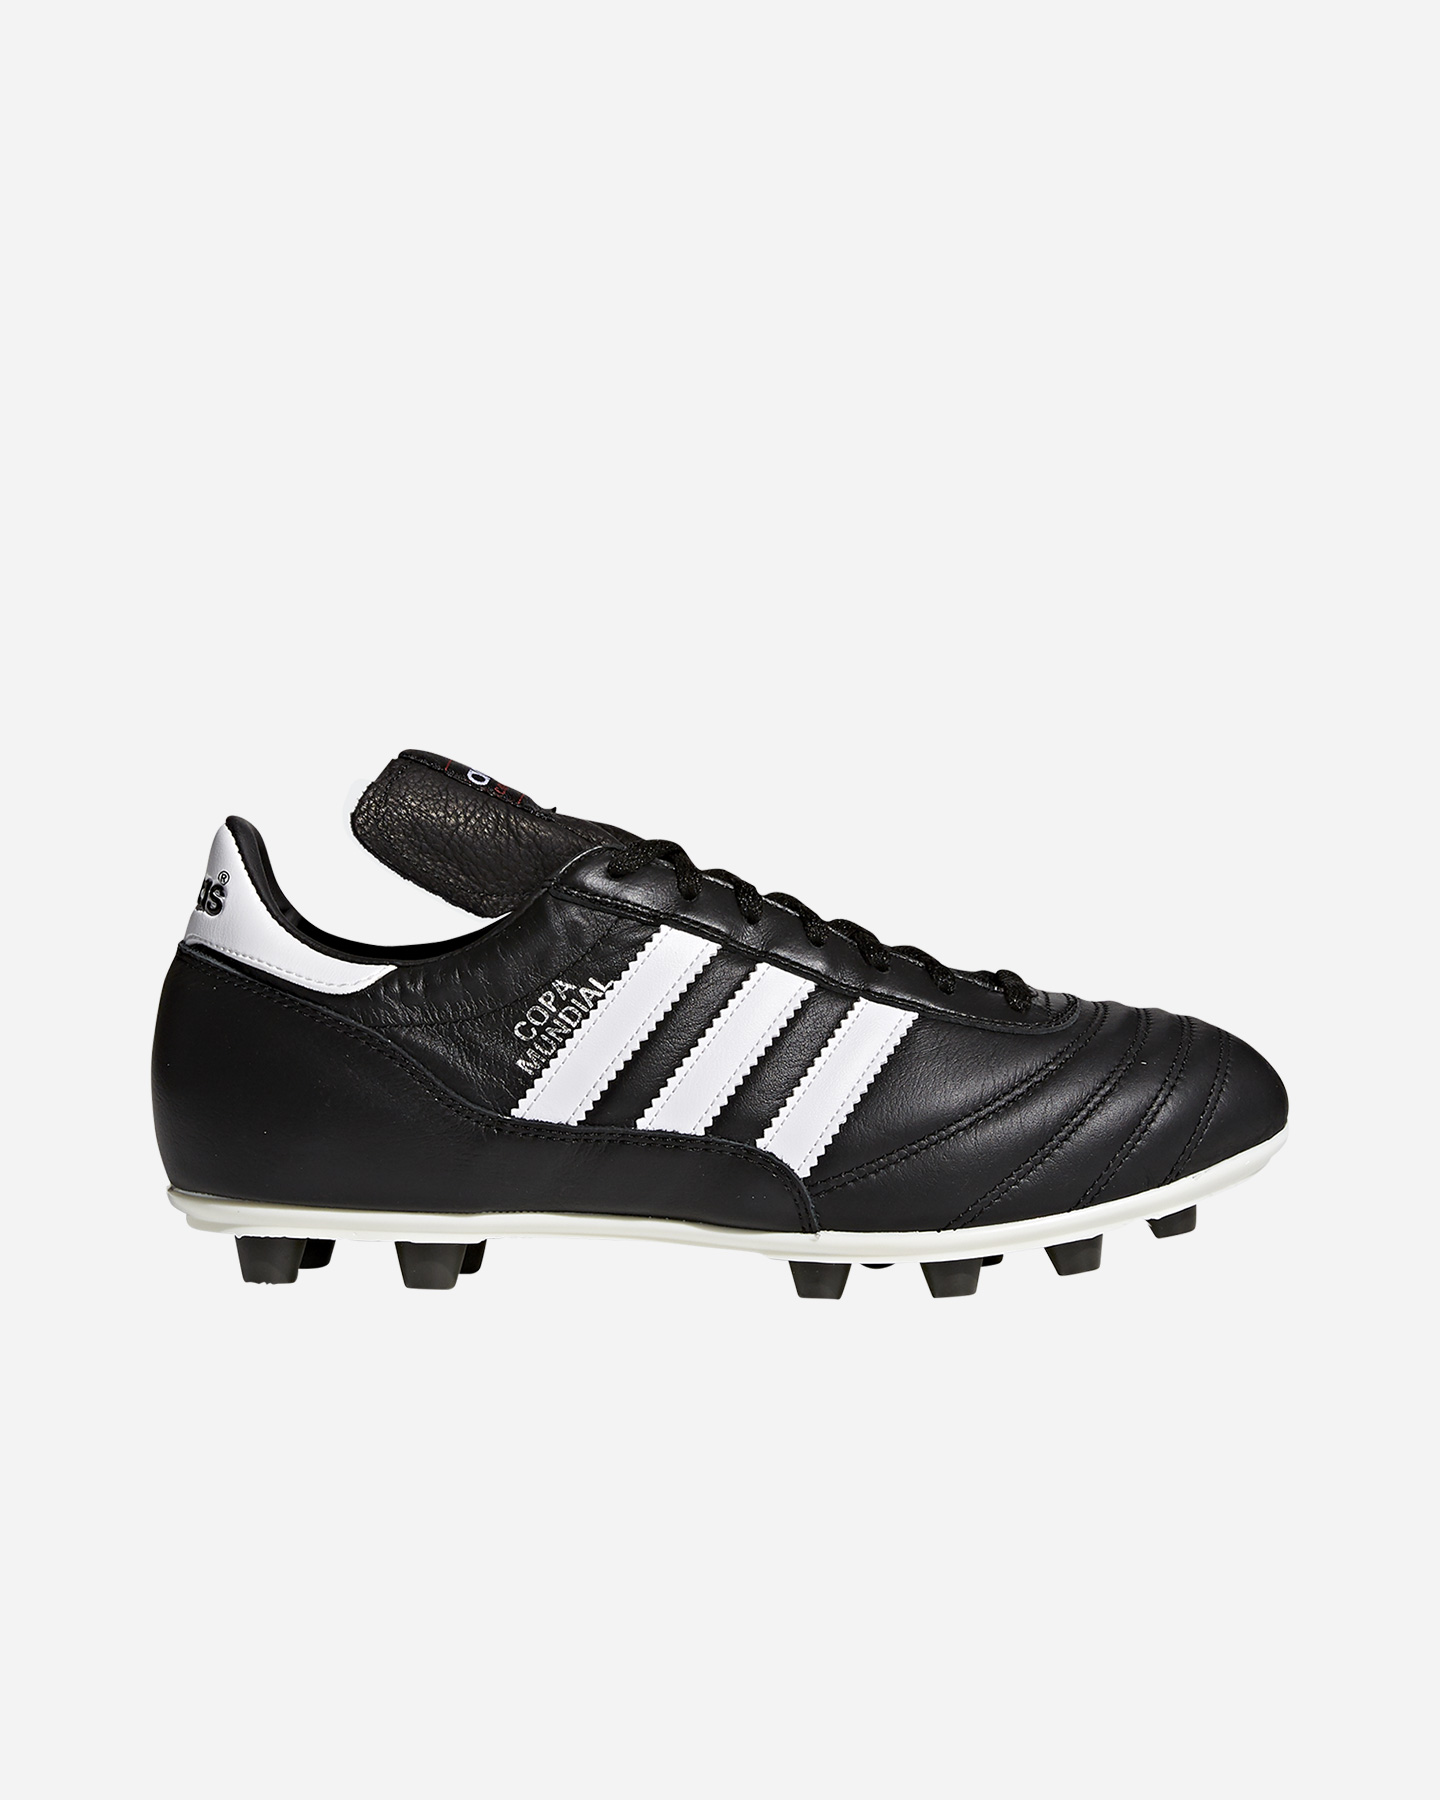 scarpe calcio adidas uomo copa